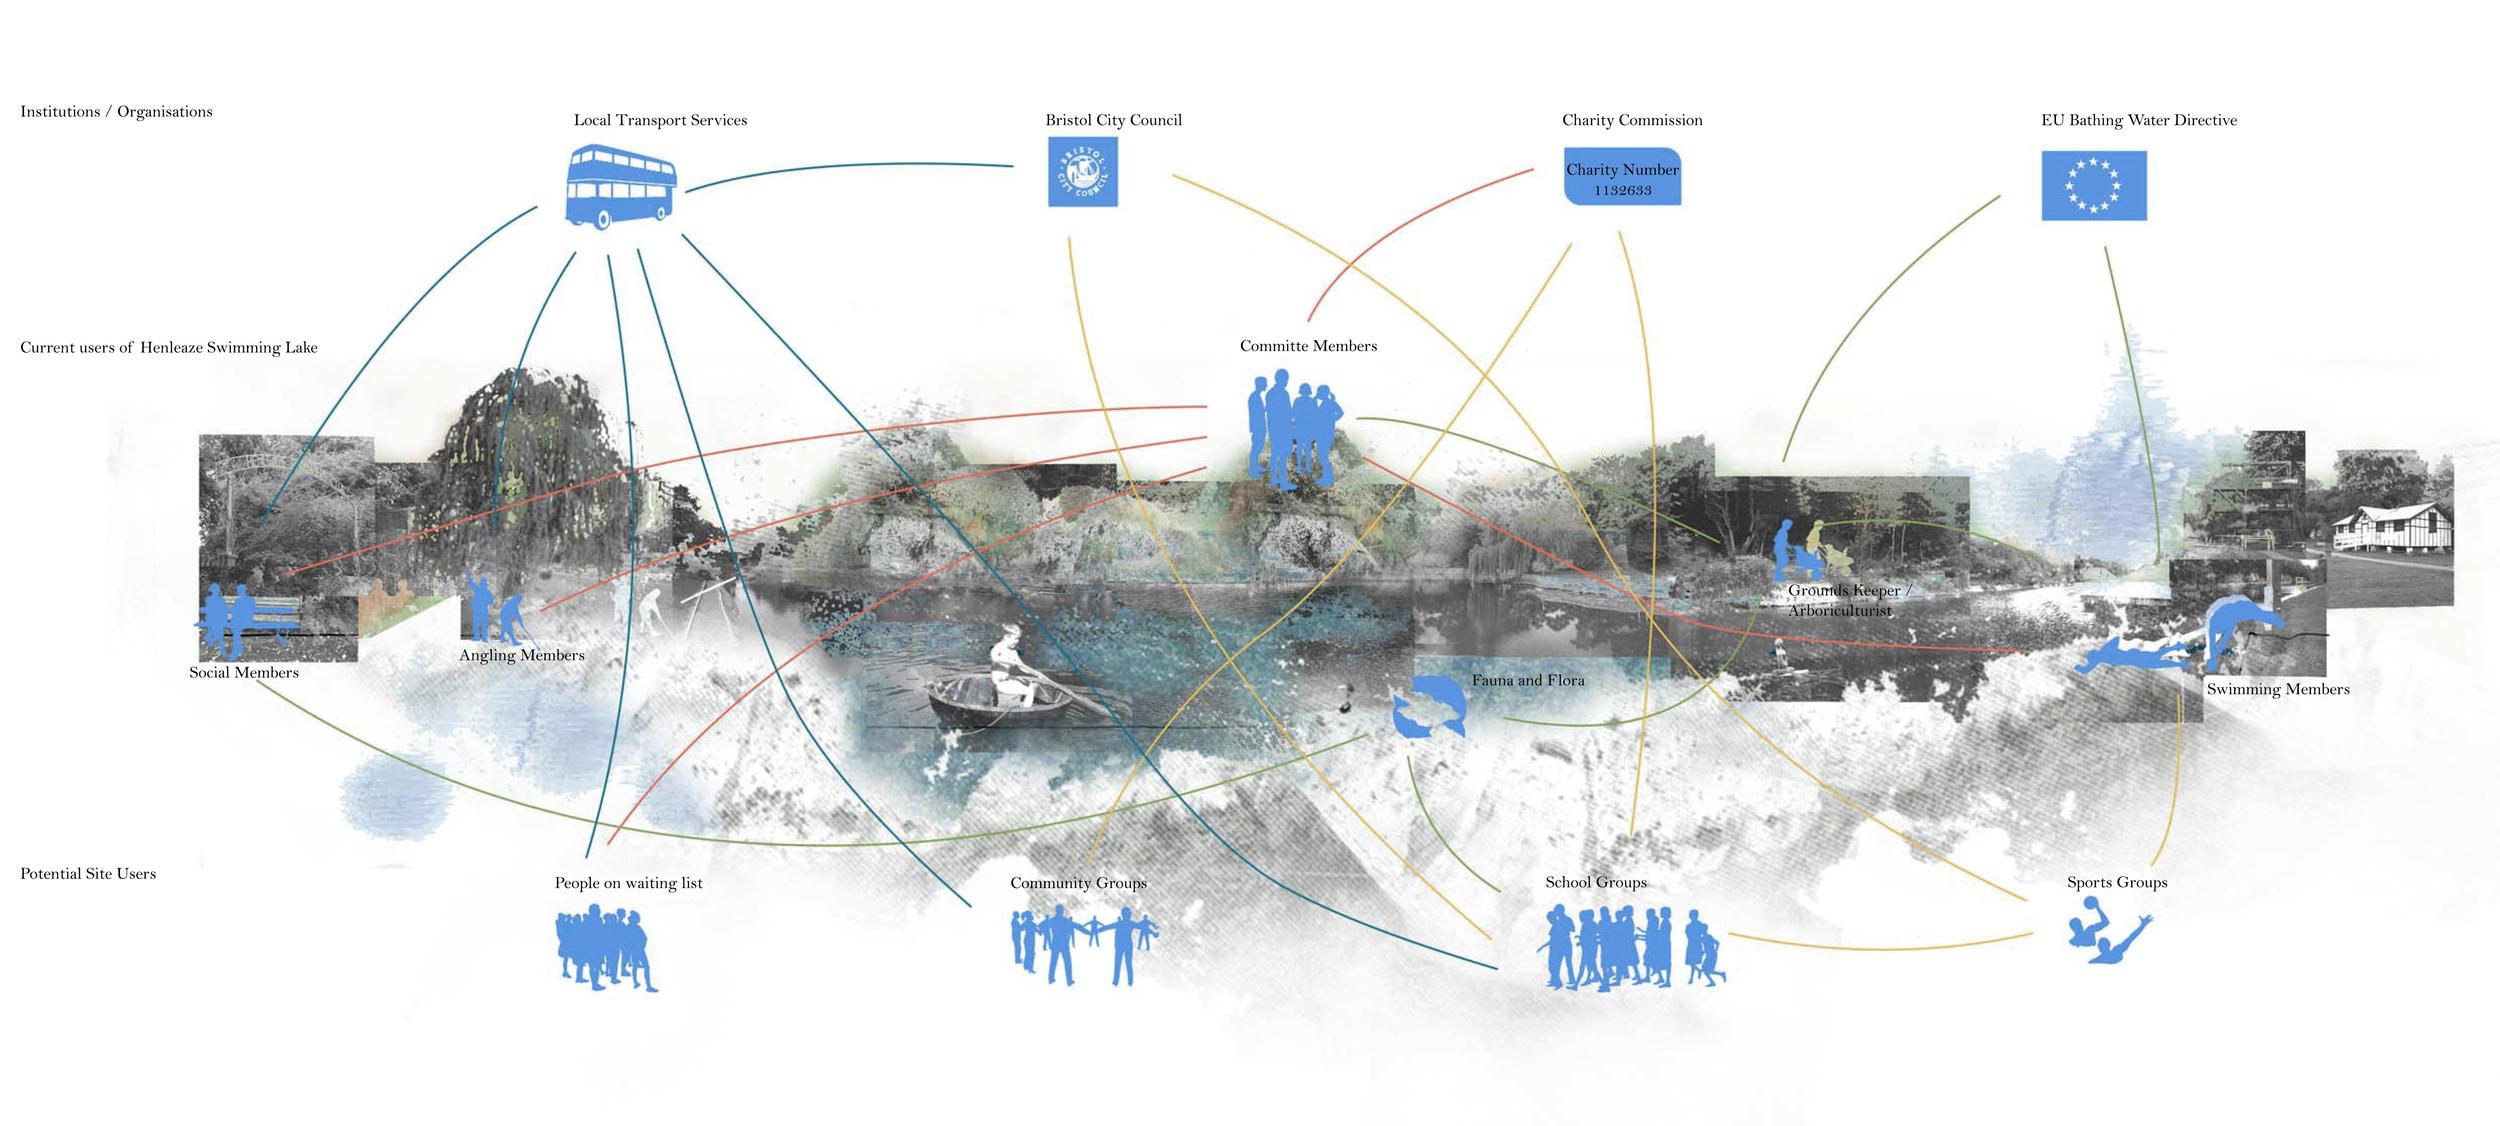 Actor Network Diagram REV 12.11.jpg